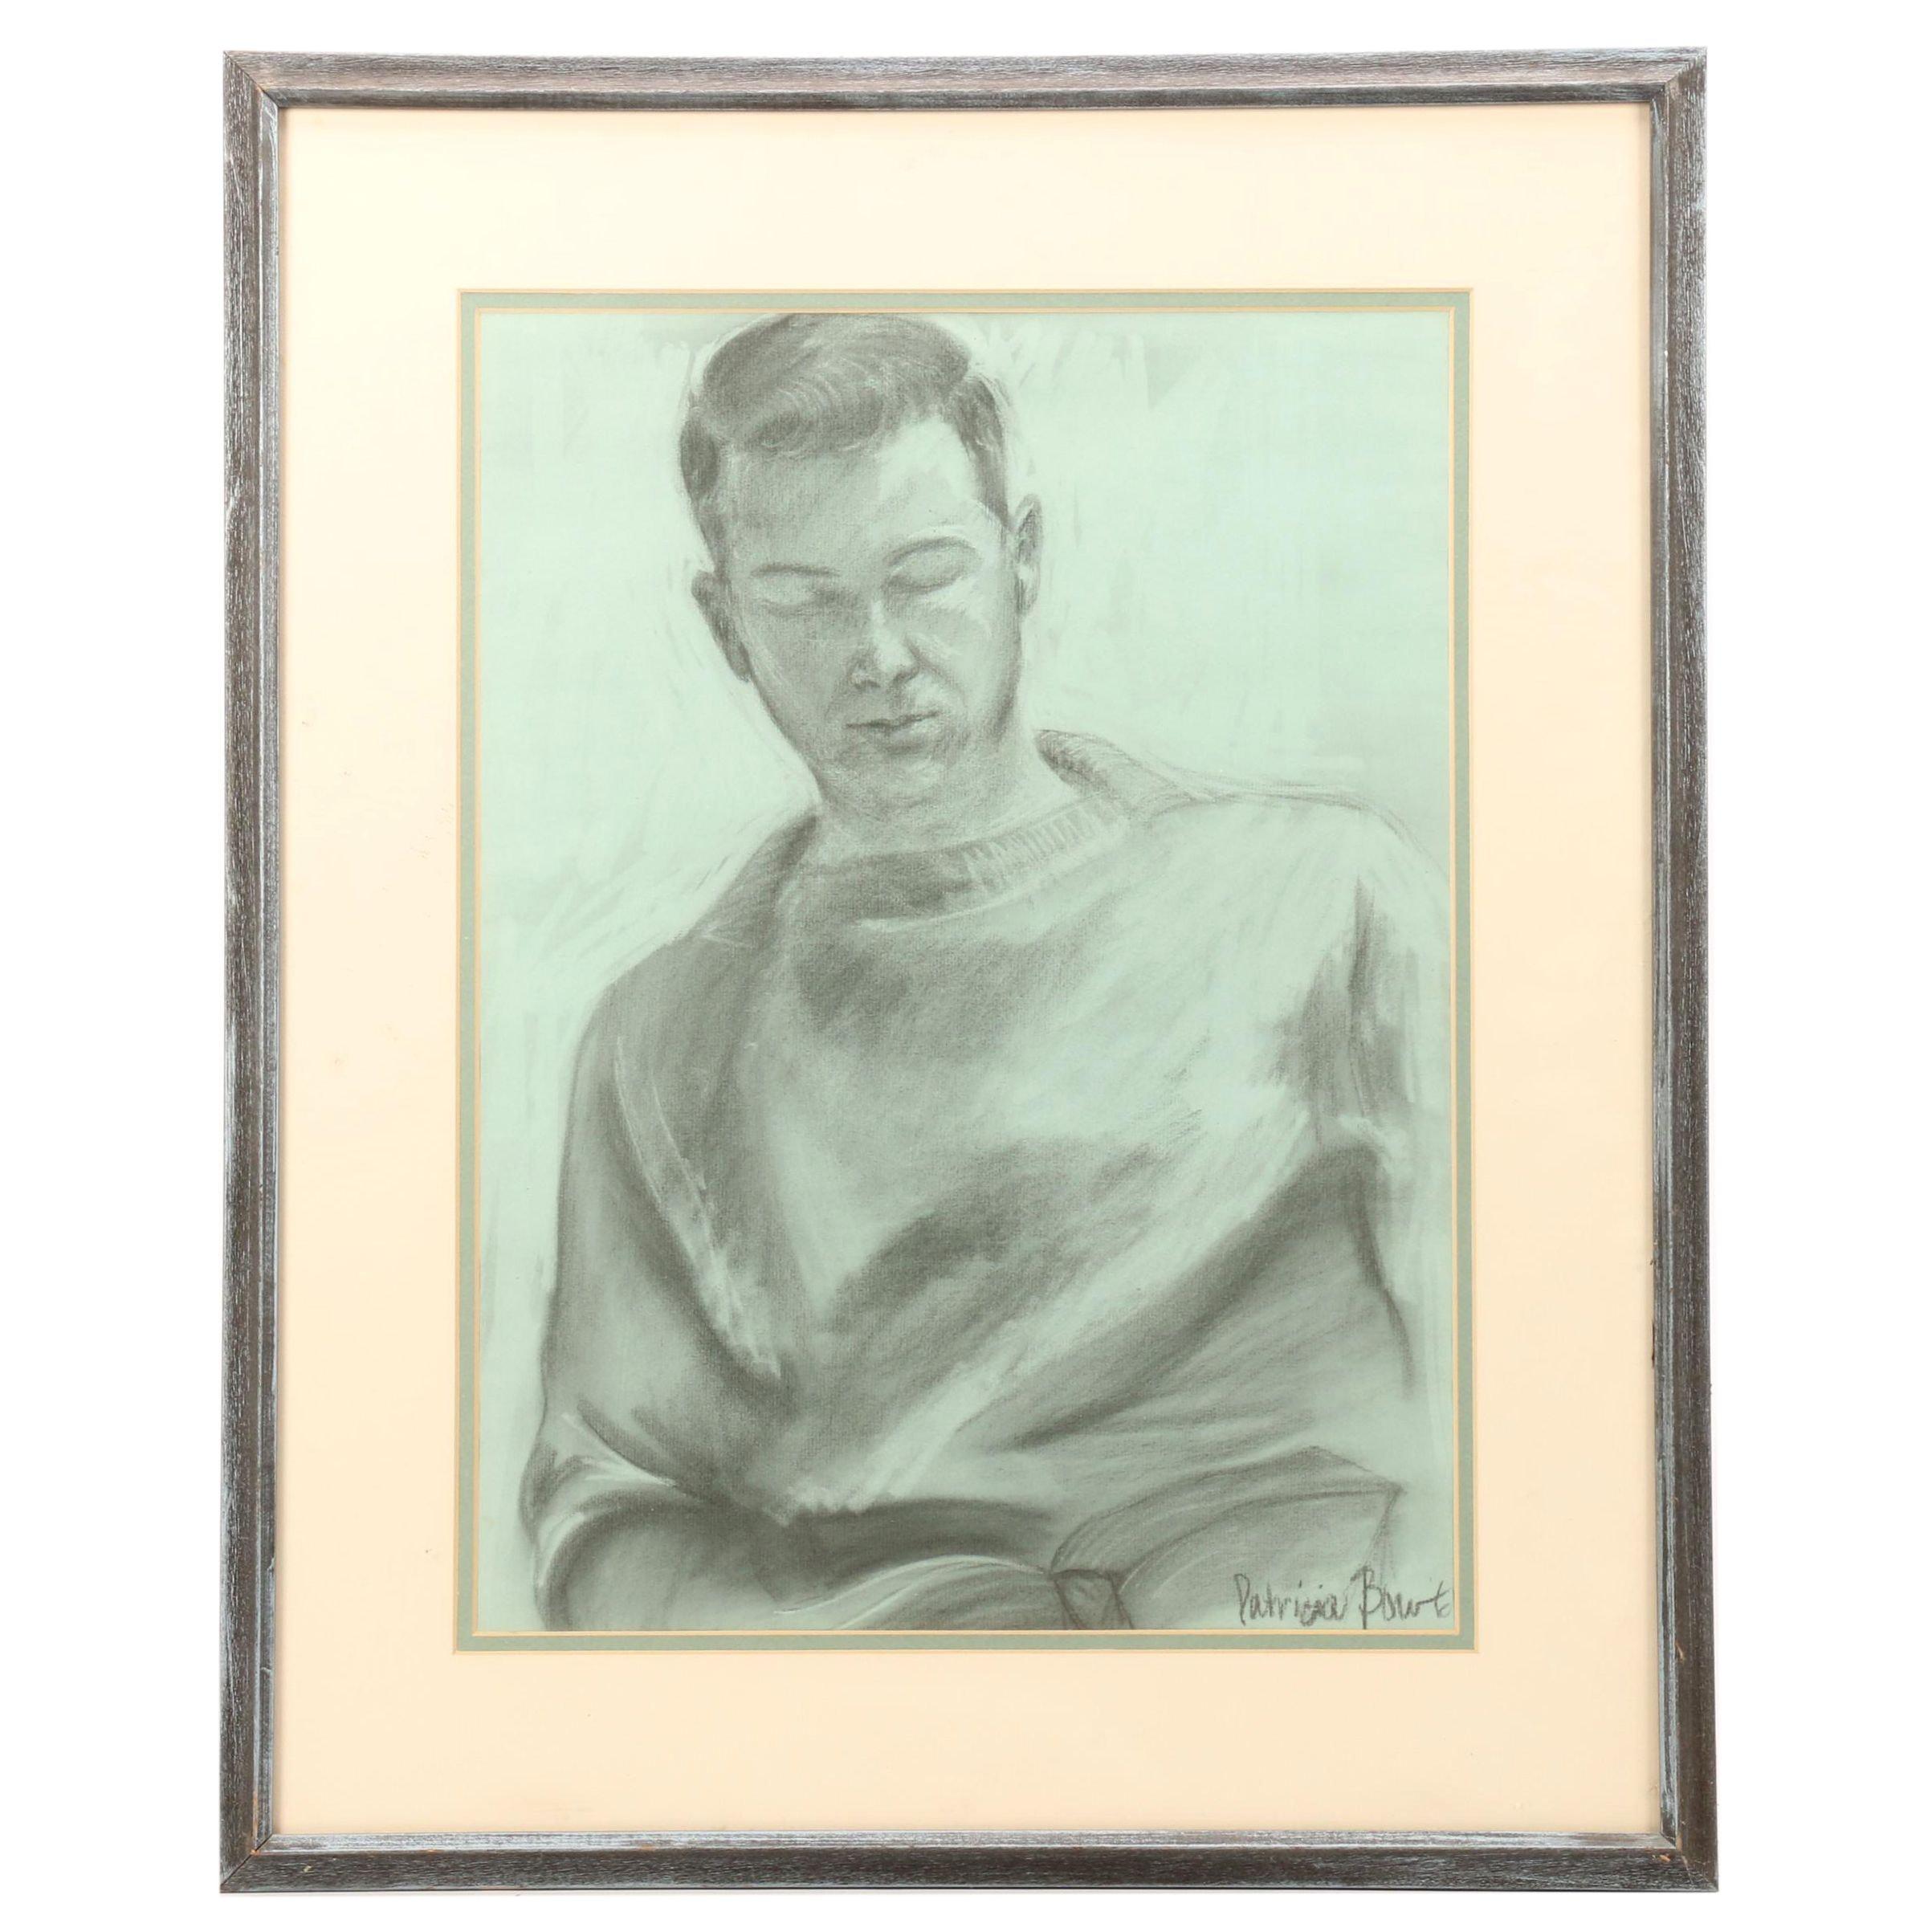 Patricia Kapp Bourtel Charcoal Portrait Drawing